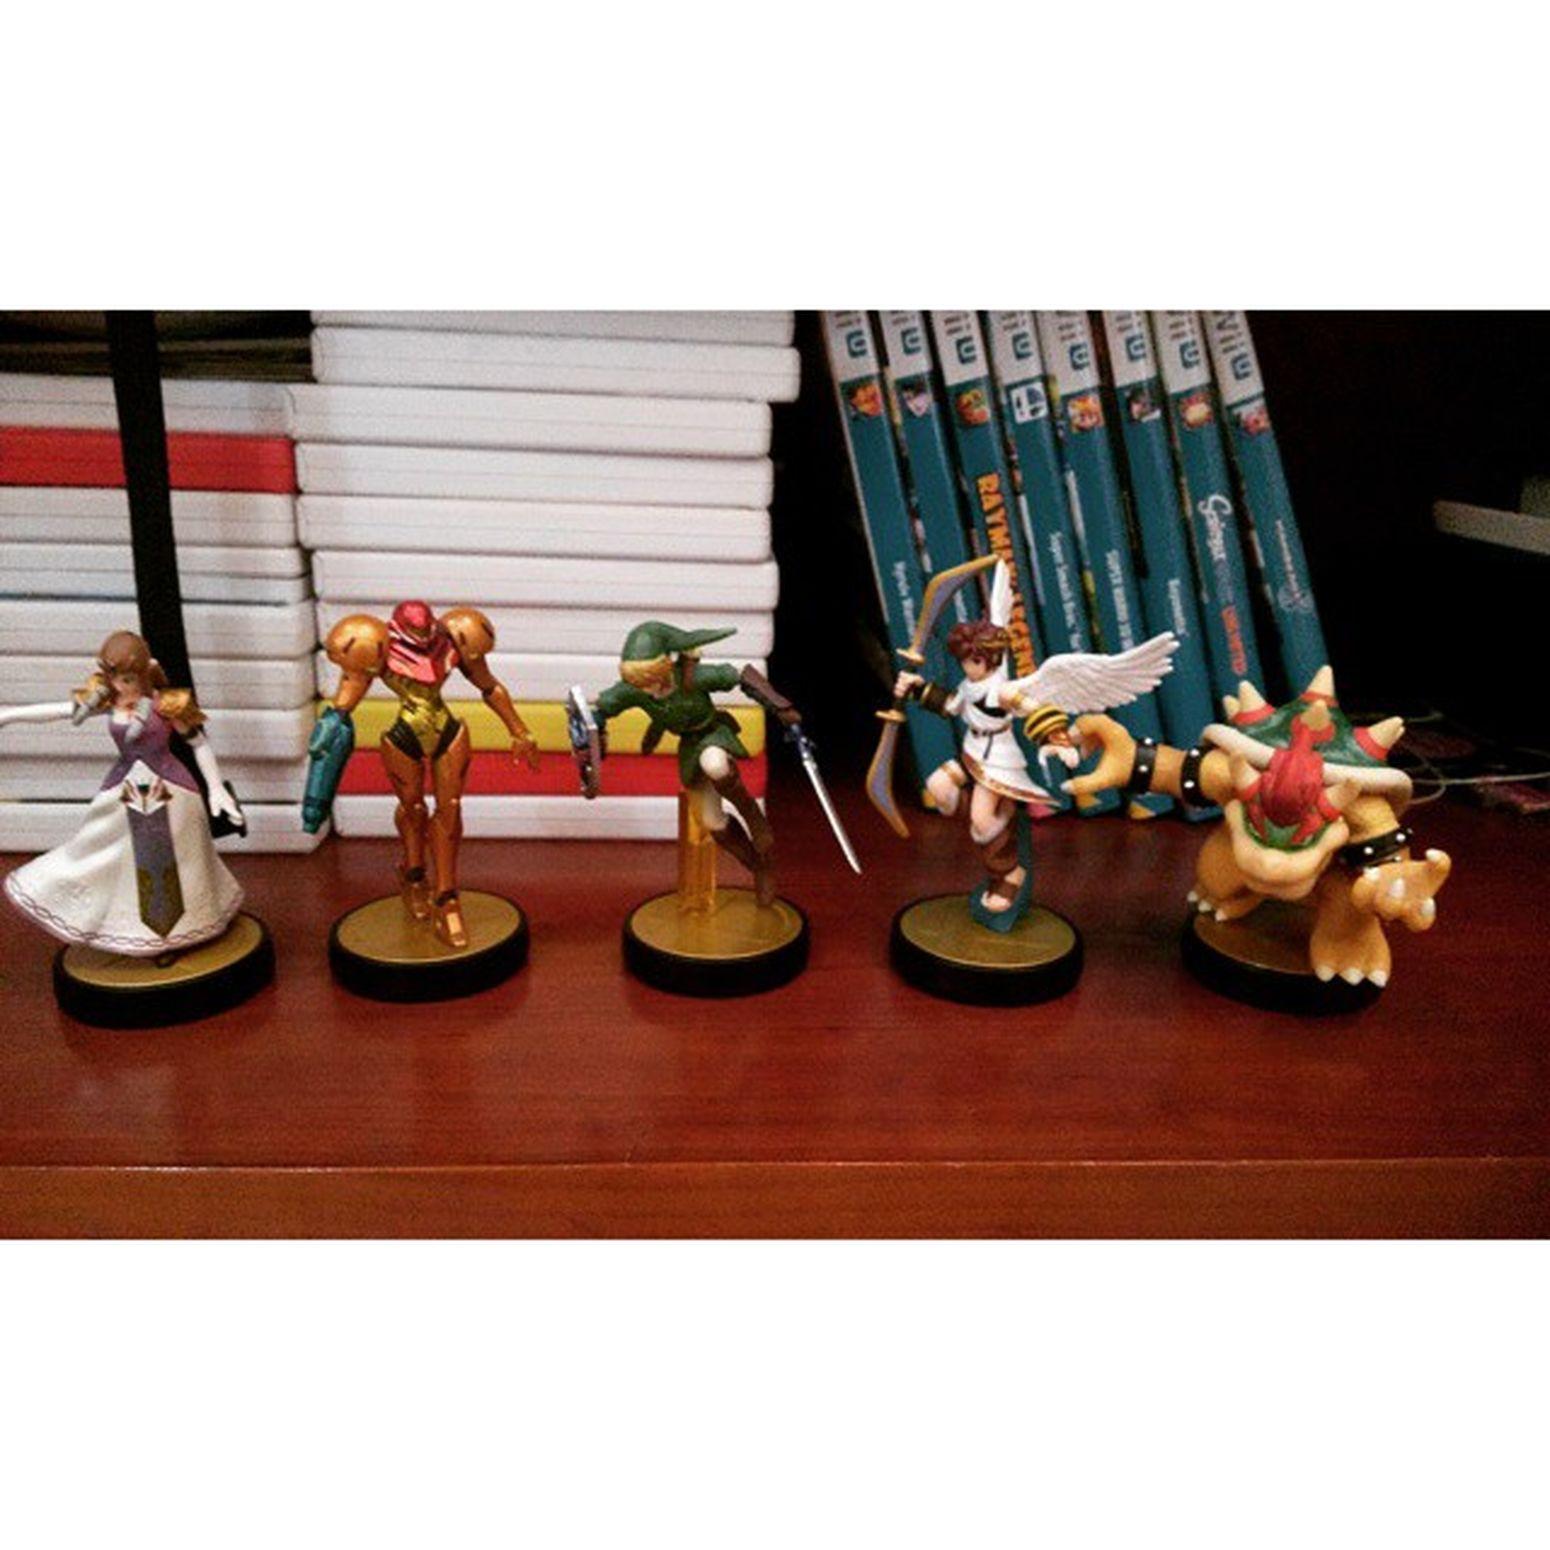 Gonna buy them all * WiiU Amiibos Supersmashbrothers Love it